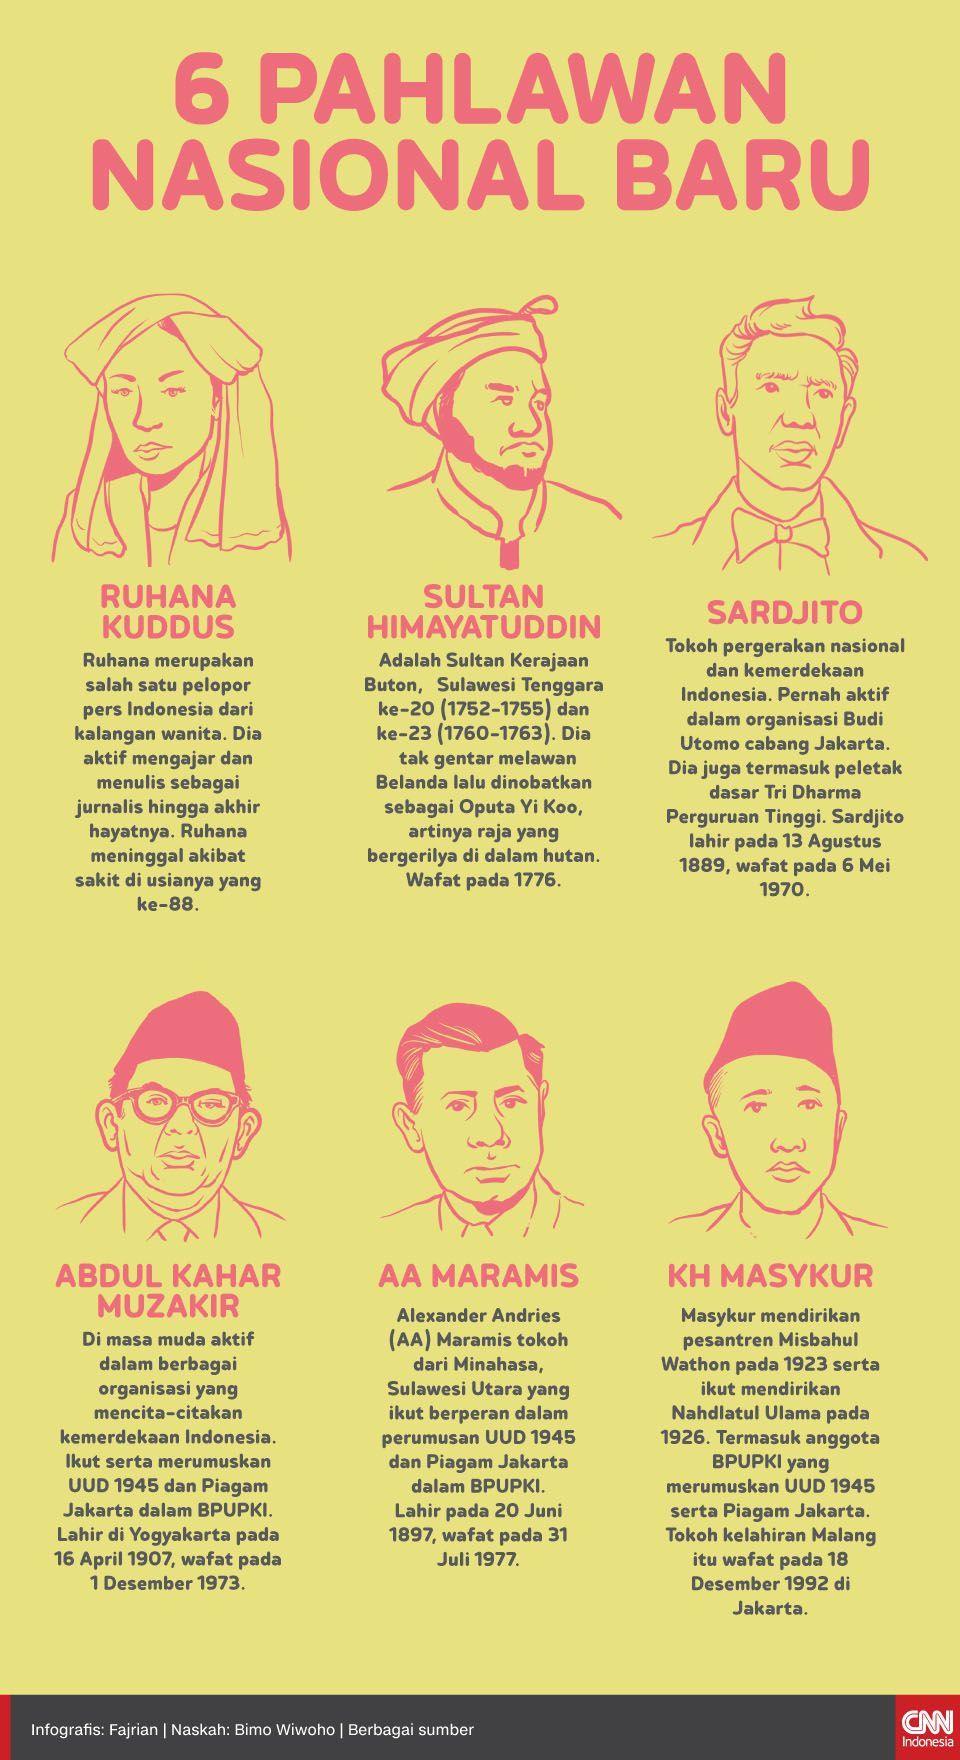 Infografis 6 Pahlawan Nasional Baru